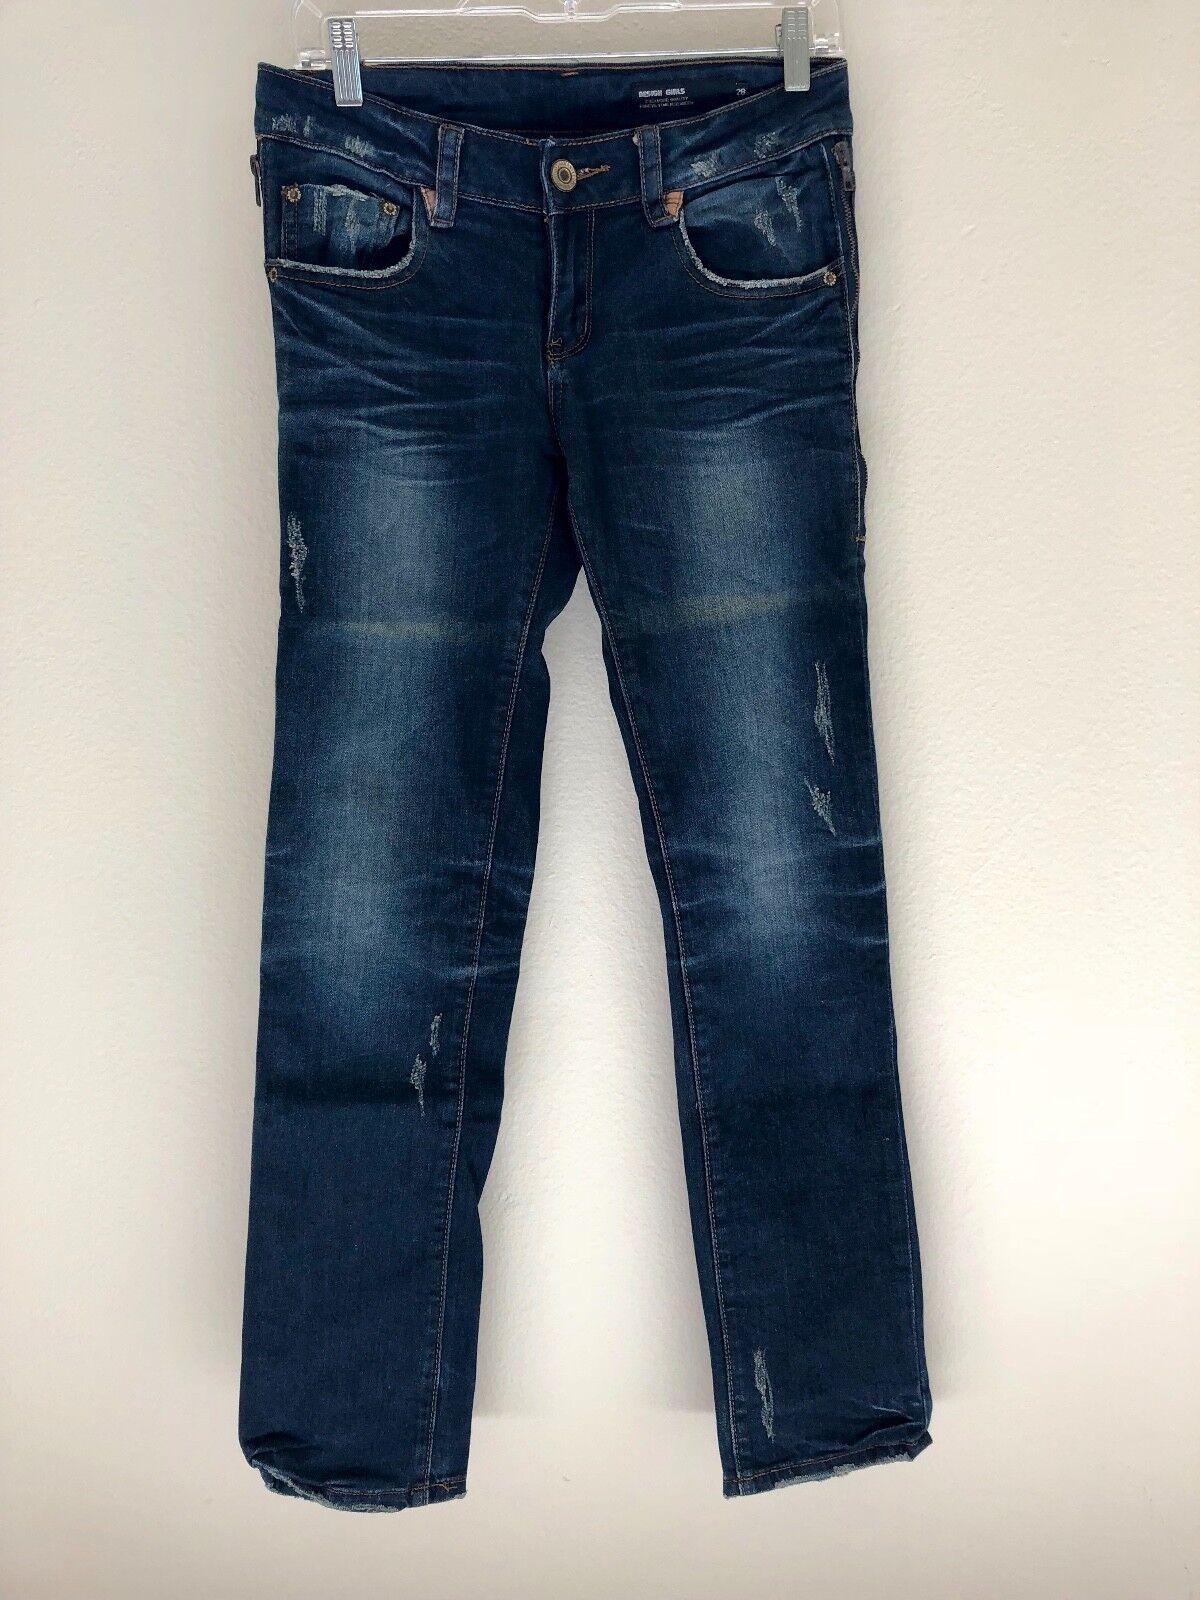 Dsquared2 Navy bluee Design Girls Jeans. 28. Waist 30.0